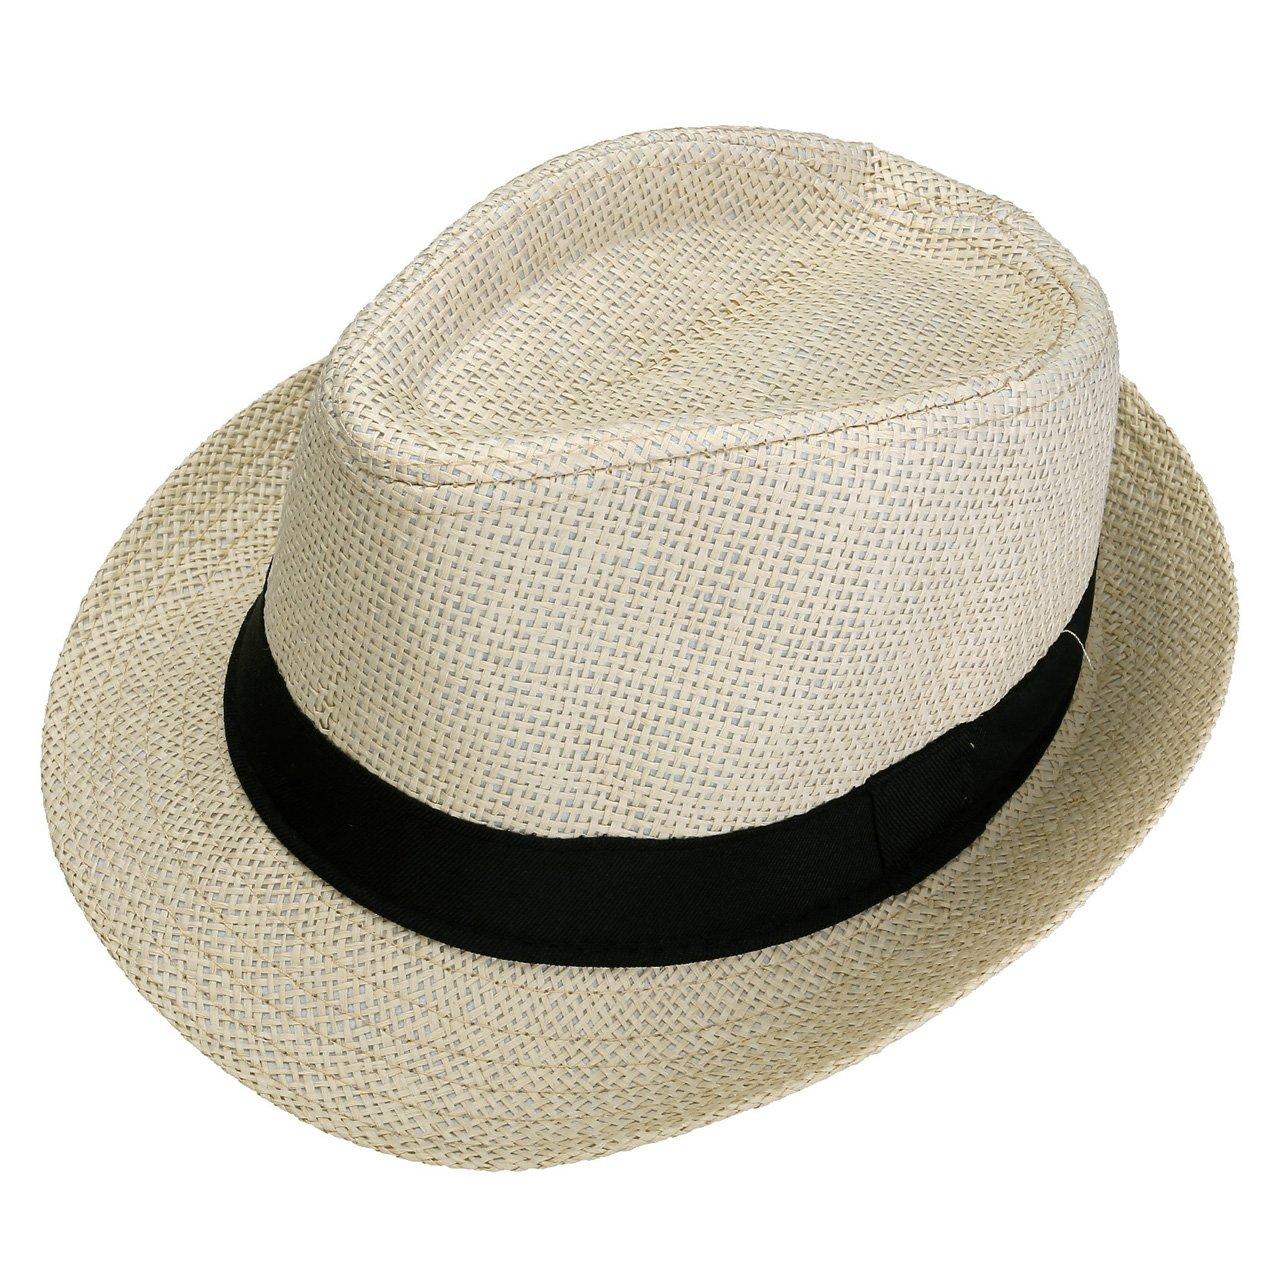 5edb01ed Online Cheap wholesale Faleto Unisex Summer Panama Straw Fedora Hat Short  Brim Beach Sun Cap Classic Sun Hats Suppliers